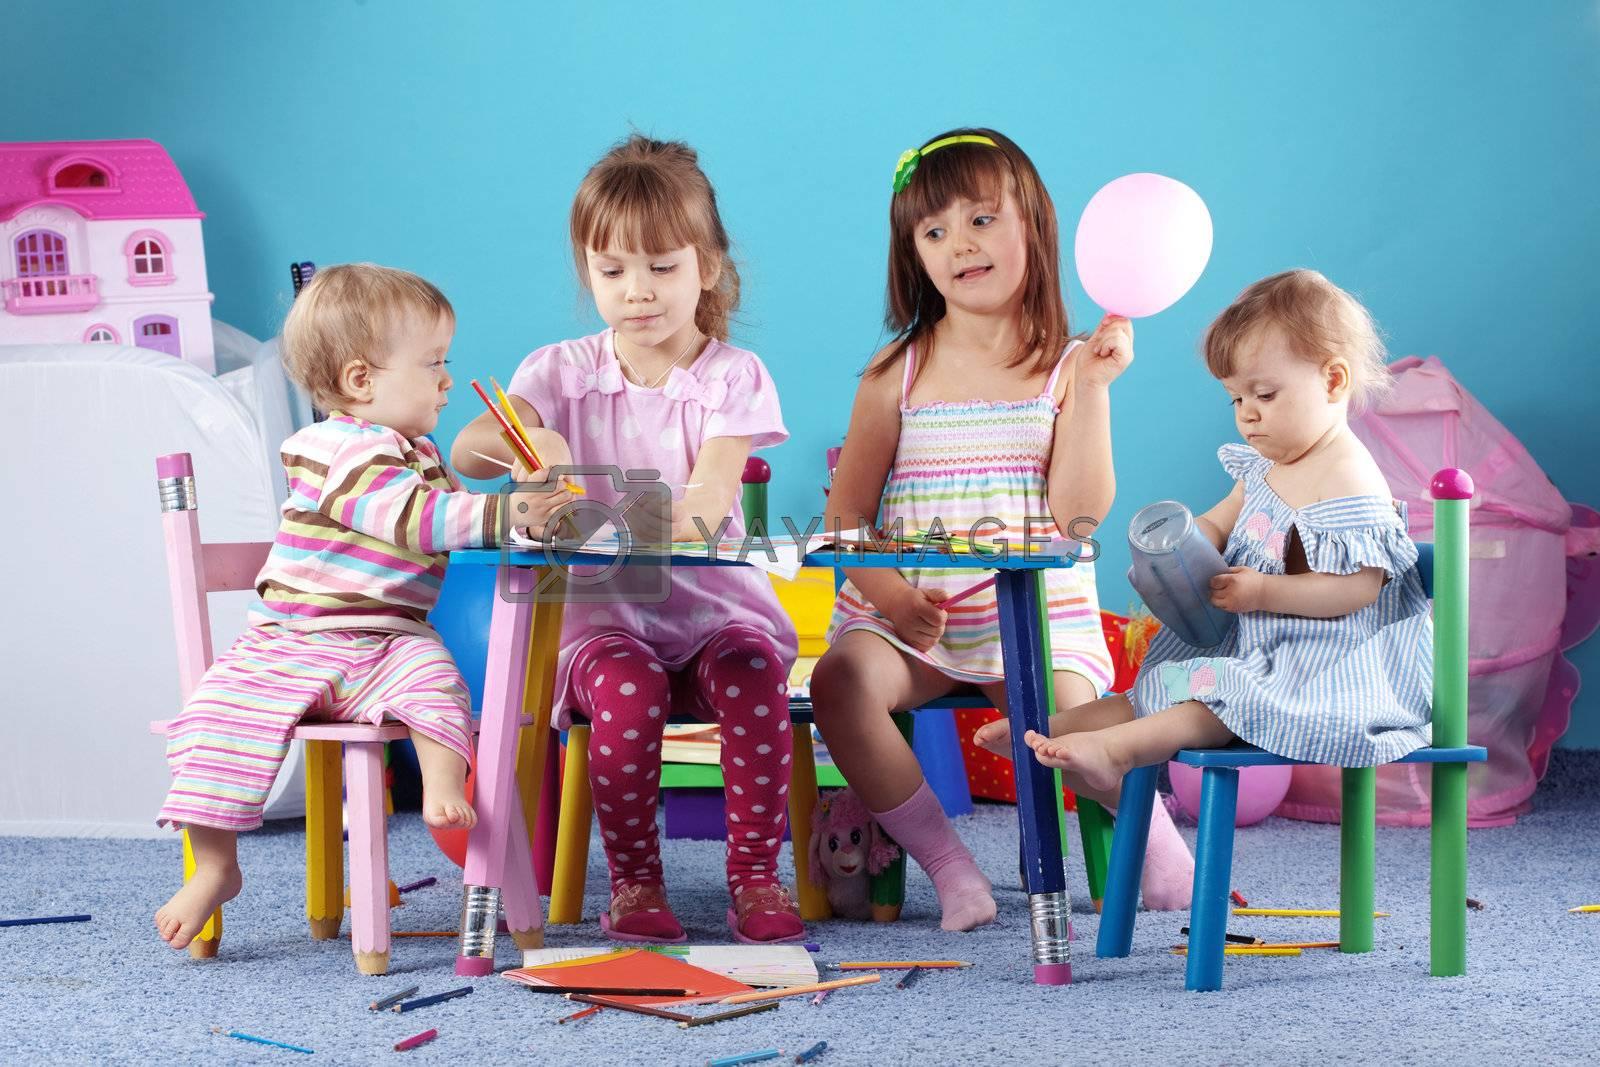 Playing kids by alenkasm